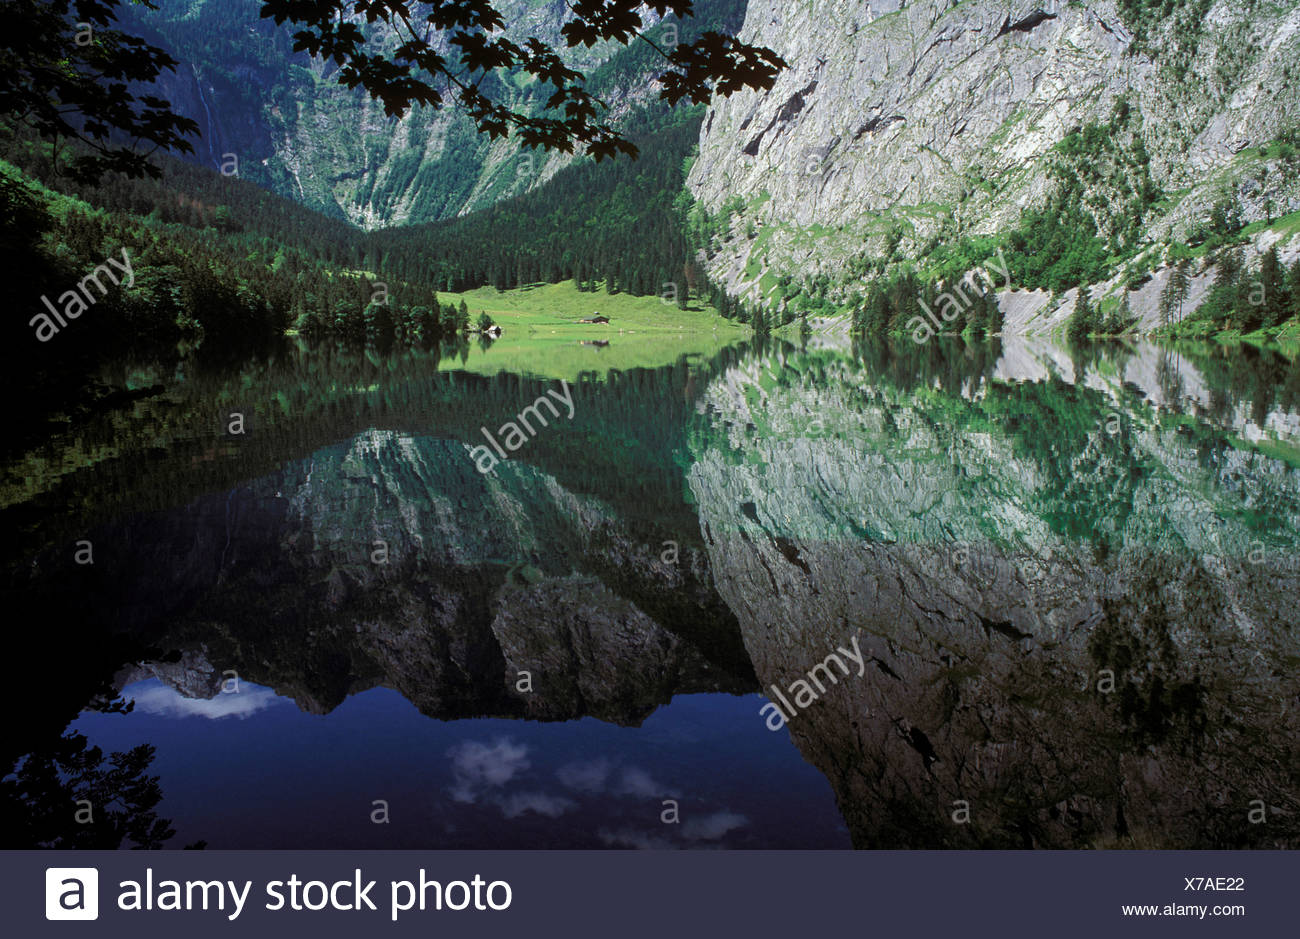 Lake Obersee, Nationalpark Berchtesgaden (Berchtesgaden National Park), Berchtesgadener Alpen (Berchtesgaden Alps), Oberbayern  Stock Photo